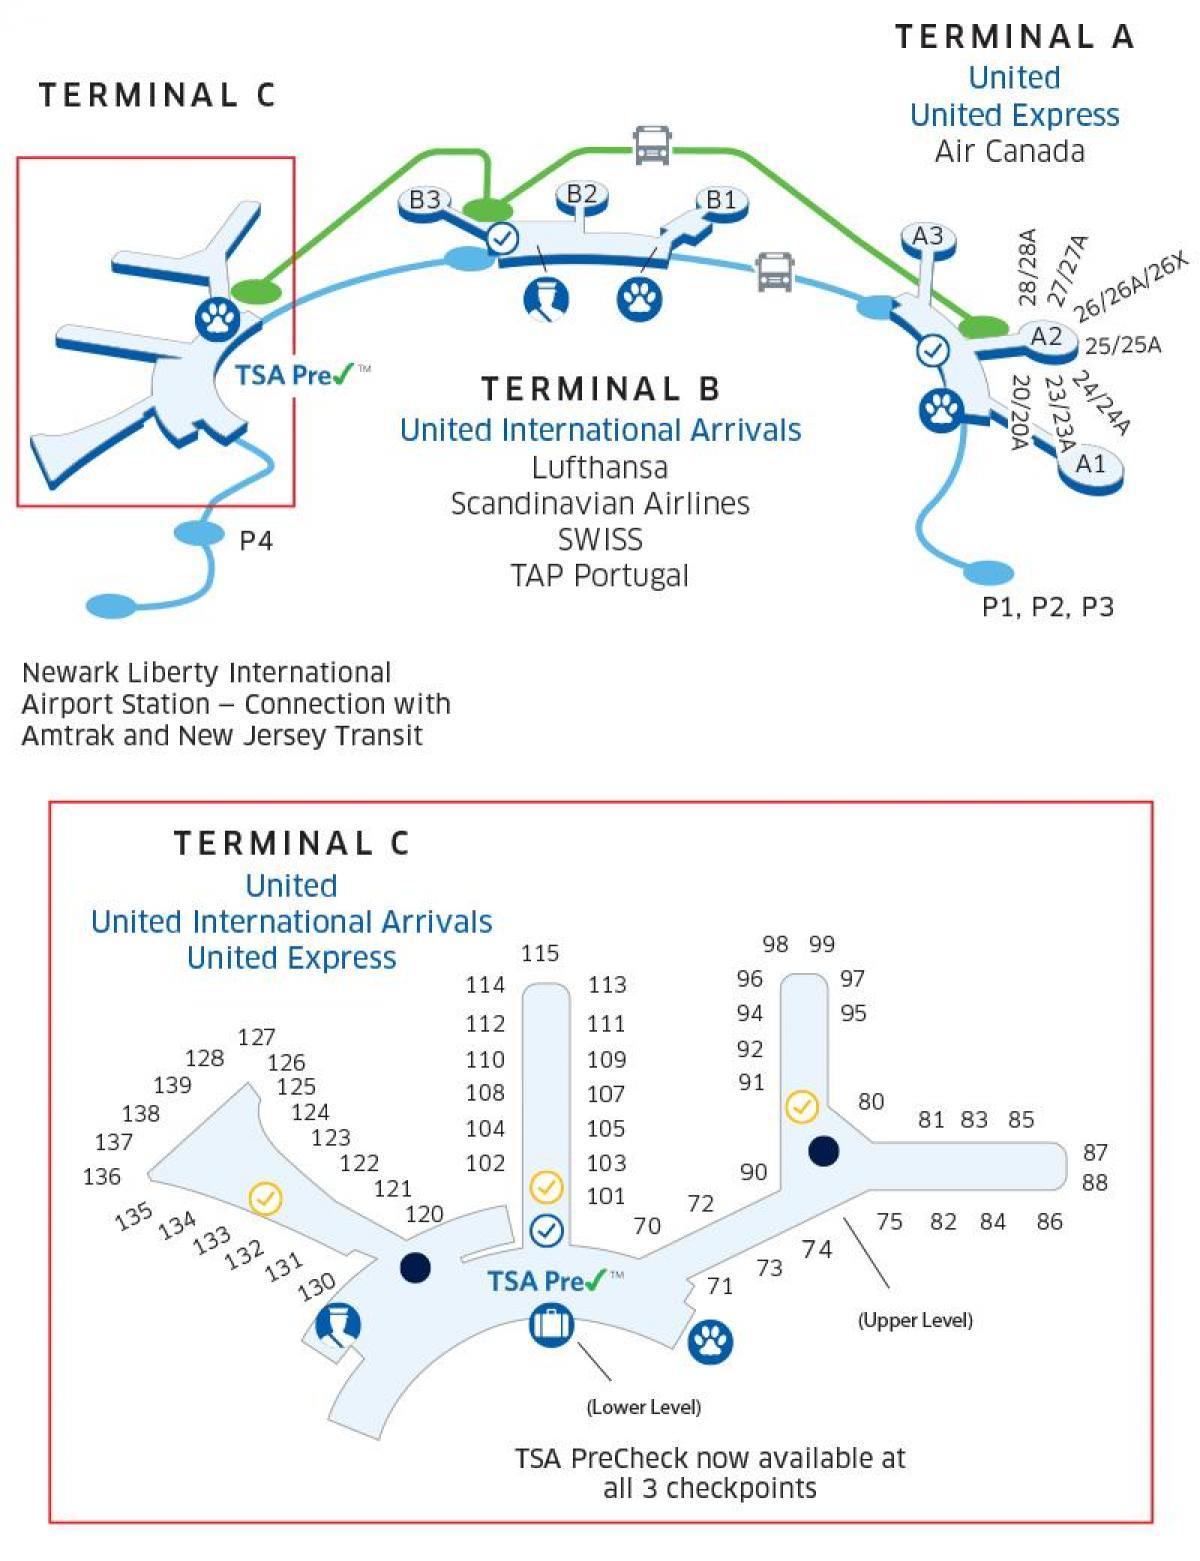 denver terminal c map » 4K Pictures | 4K Pictures [Full HQ Wallpaper]